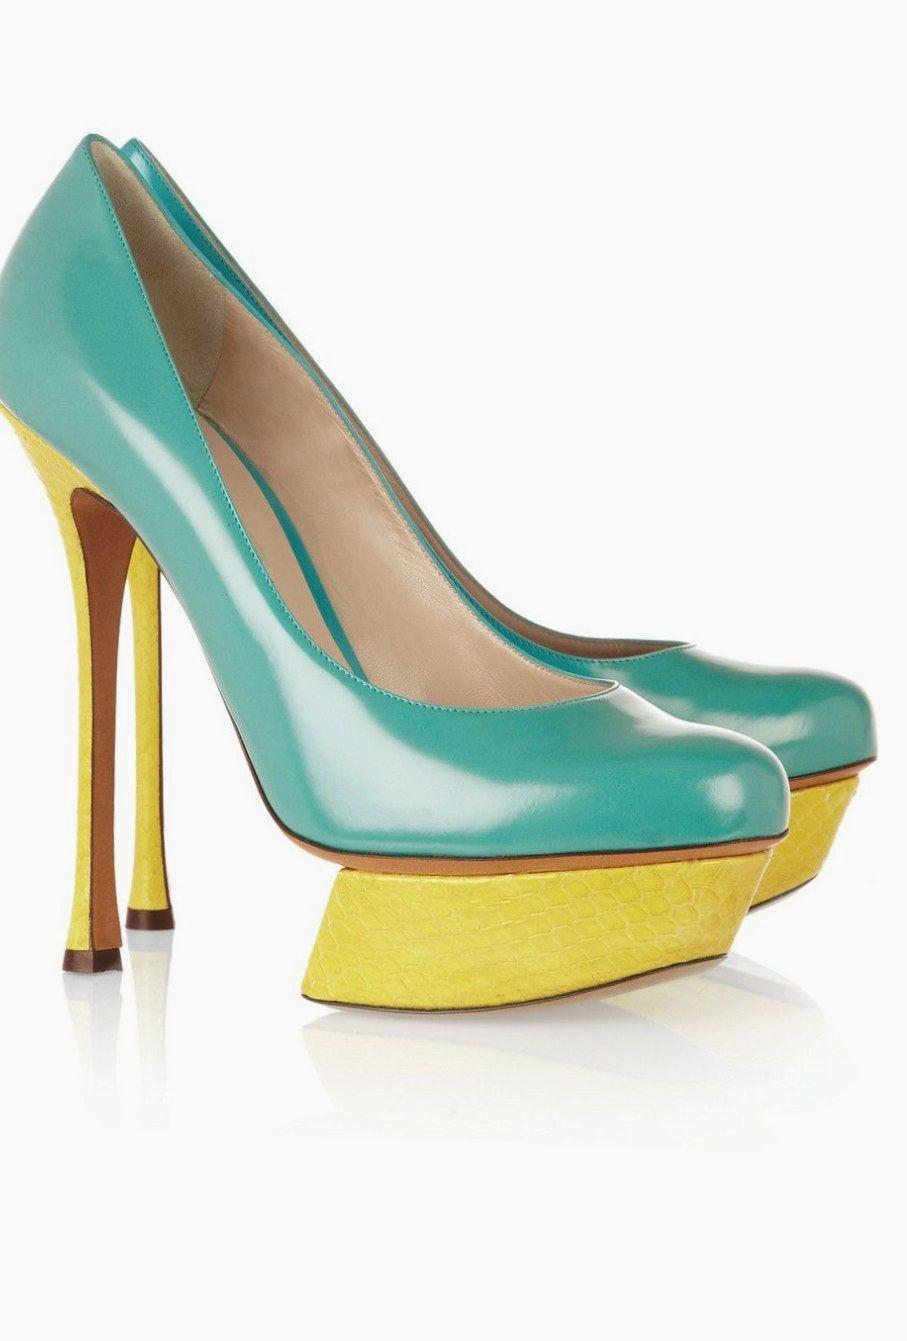 3b7980469 Do you need ladies footwear?. Ladies Shoes Size. #shoesale   Women's ...